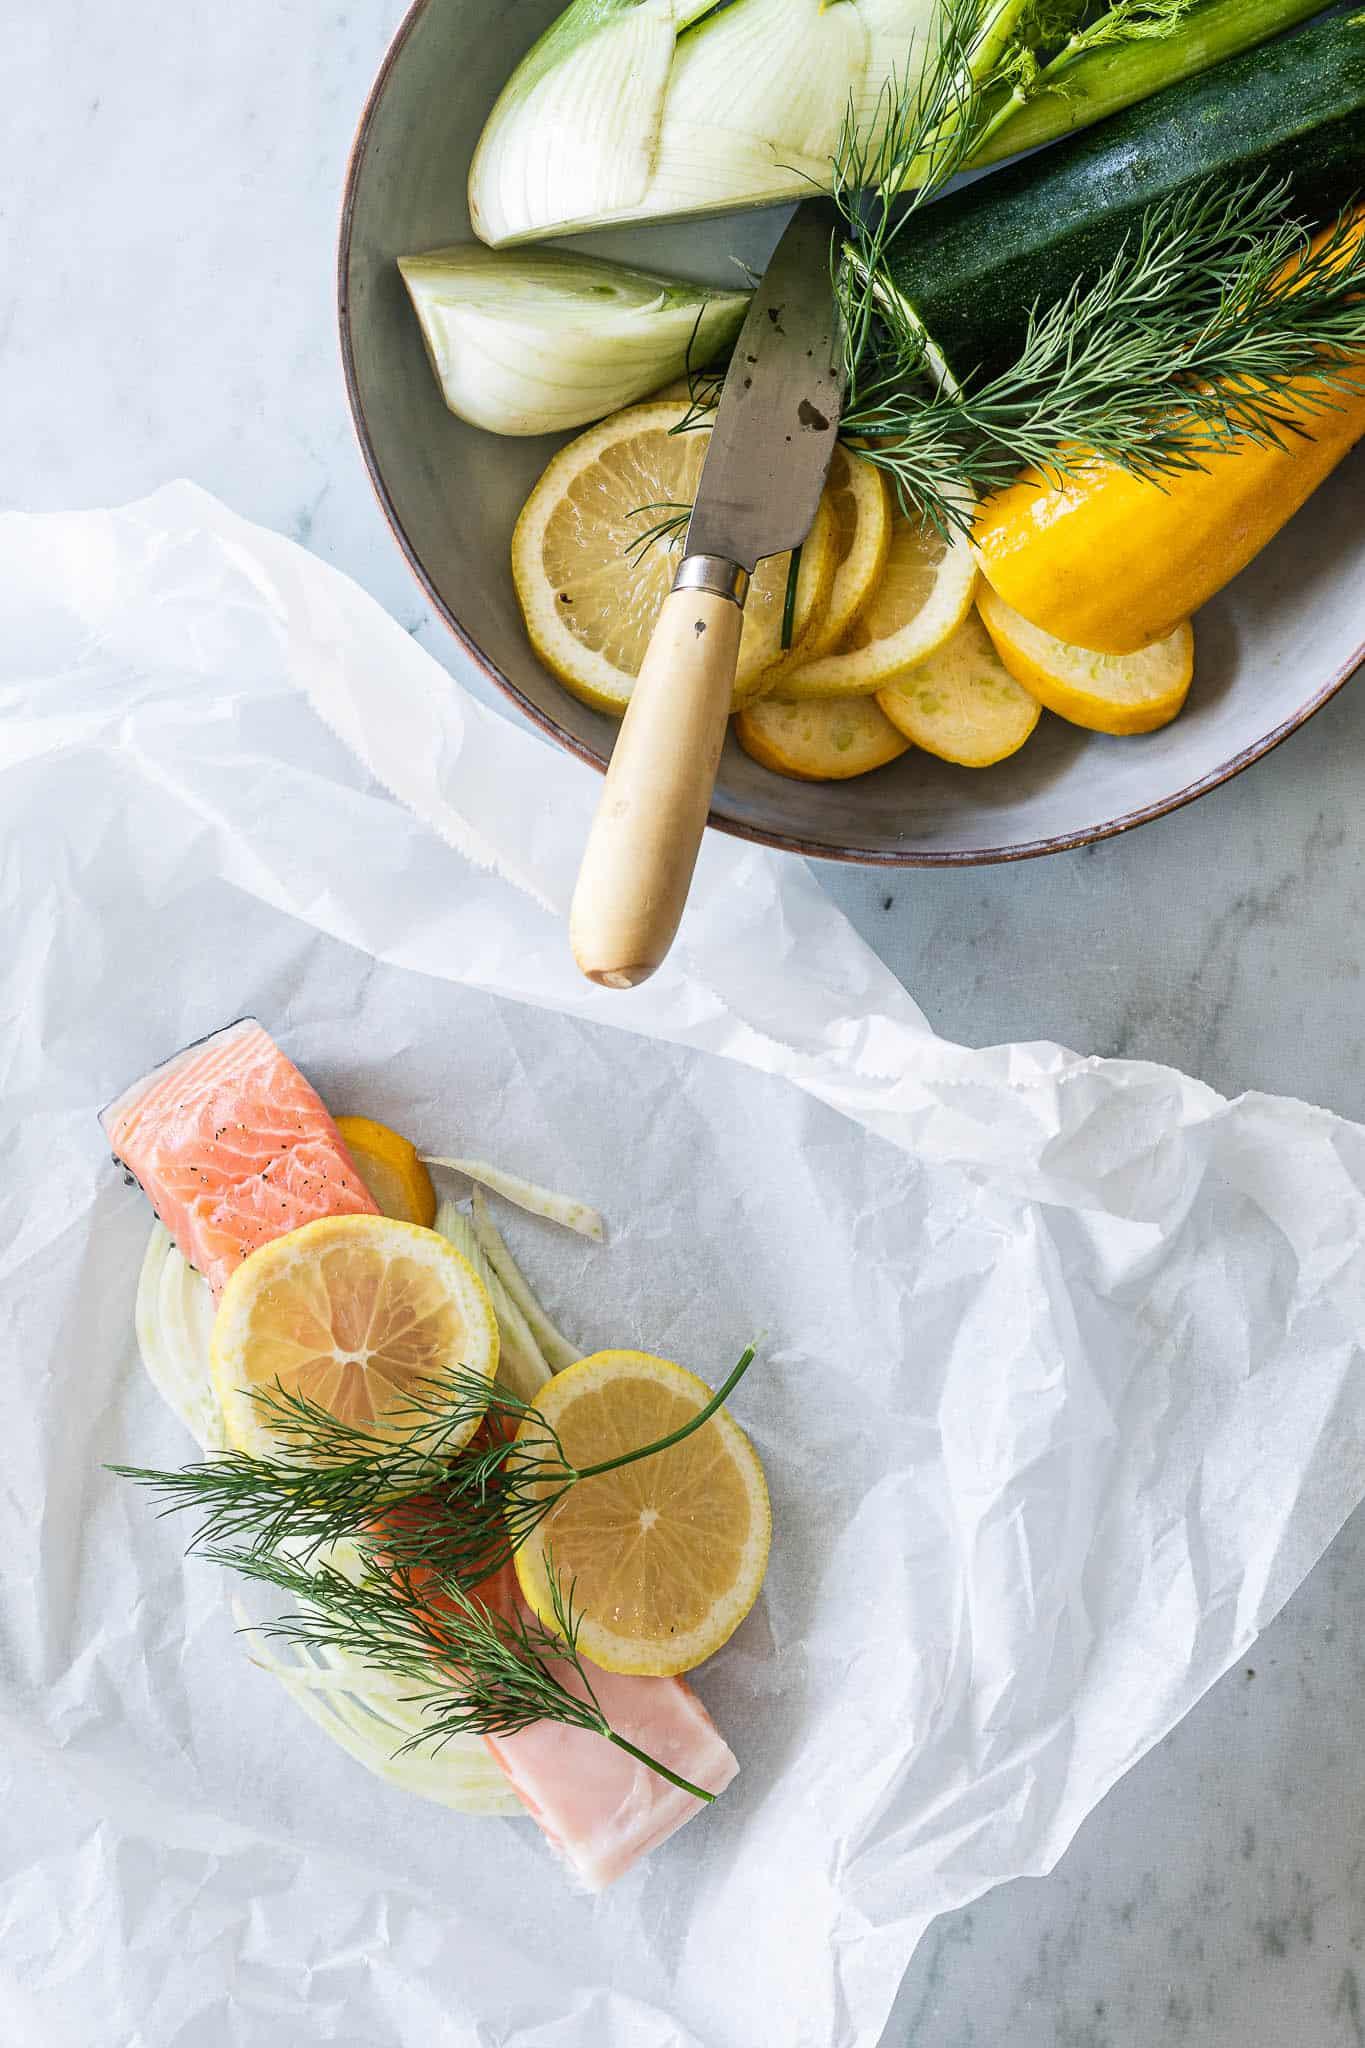 Laks en papilotte - laks i pakker i ovn